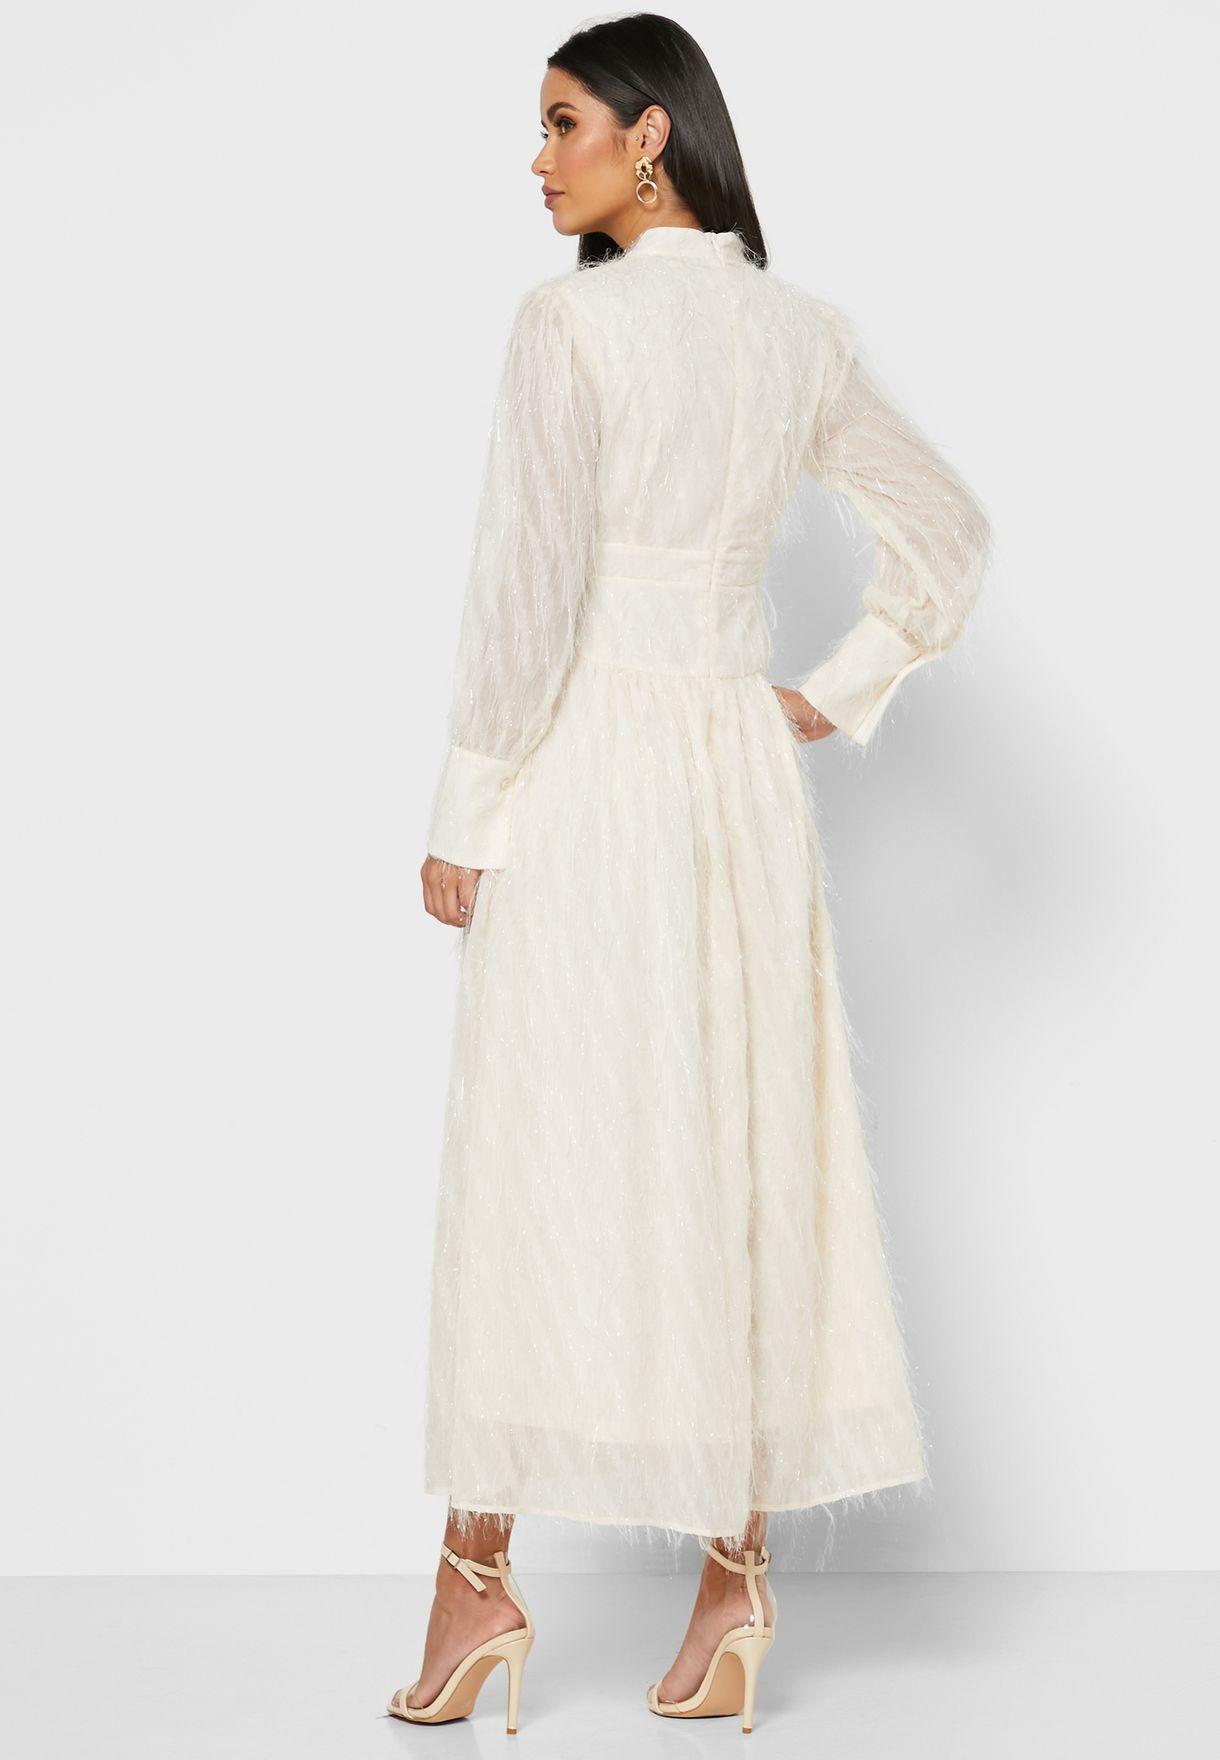 Textured Puffed Sleeve Midi Dress